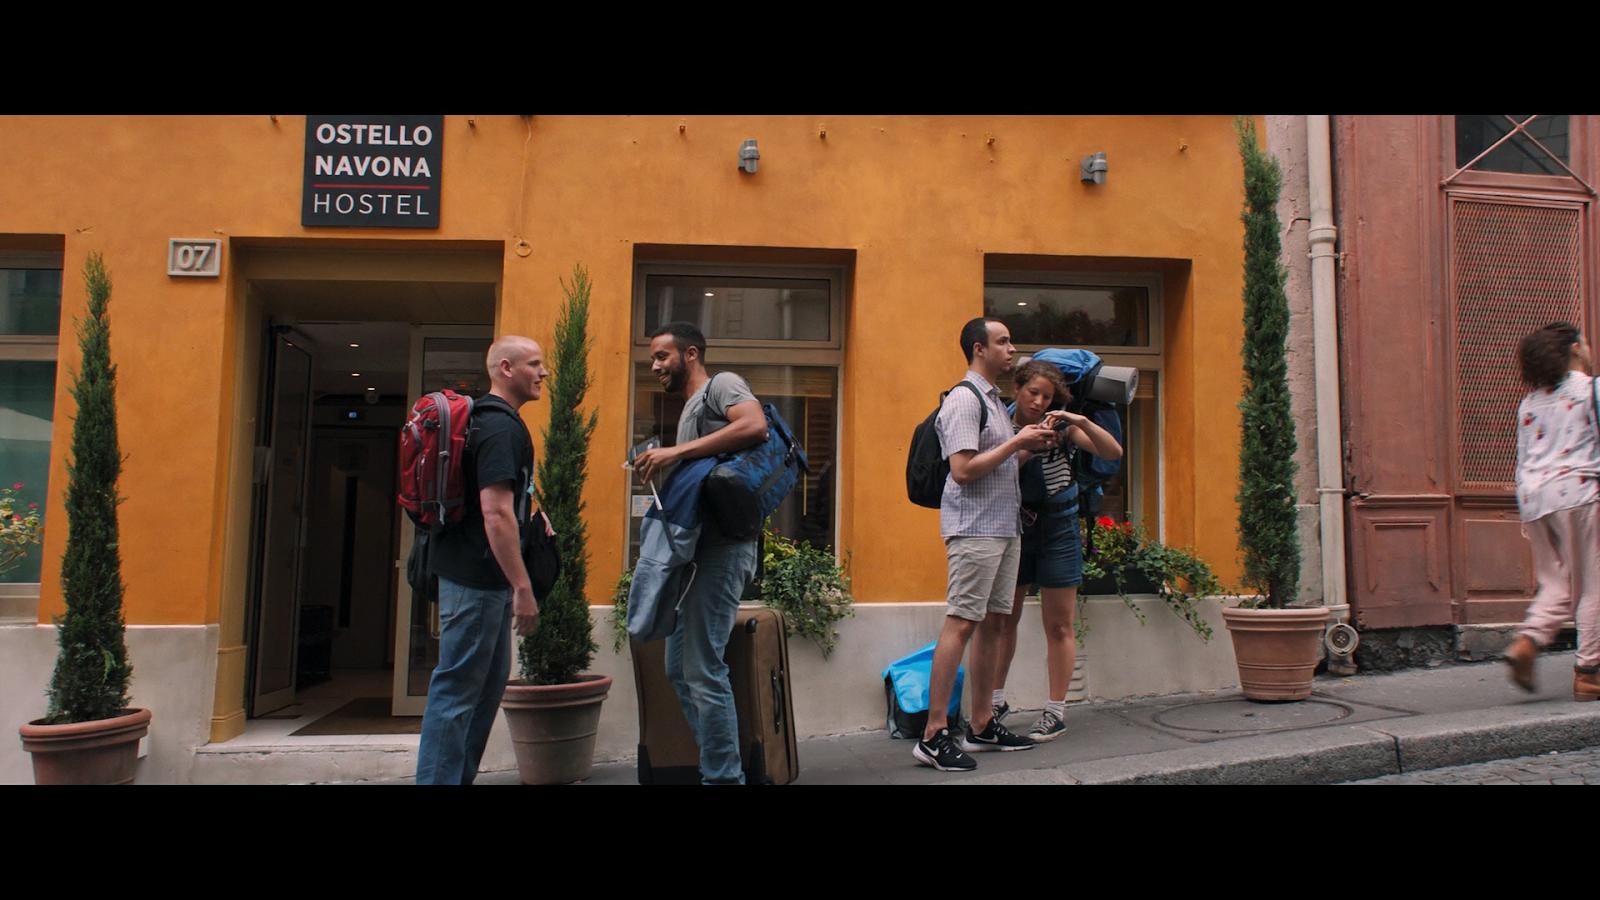 15:17 Tren a París (2018) BRRip Full HD 1080p Latino-Ingles captura 3